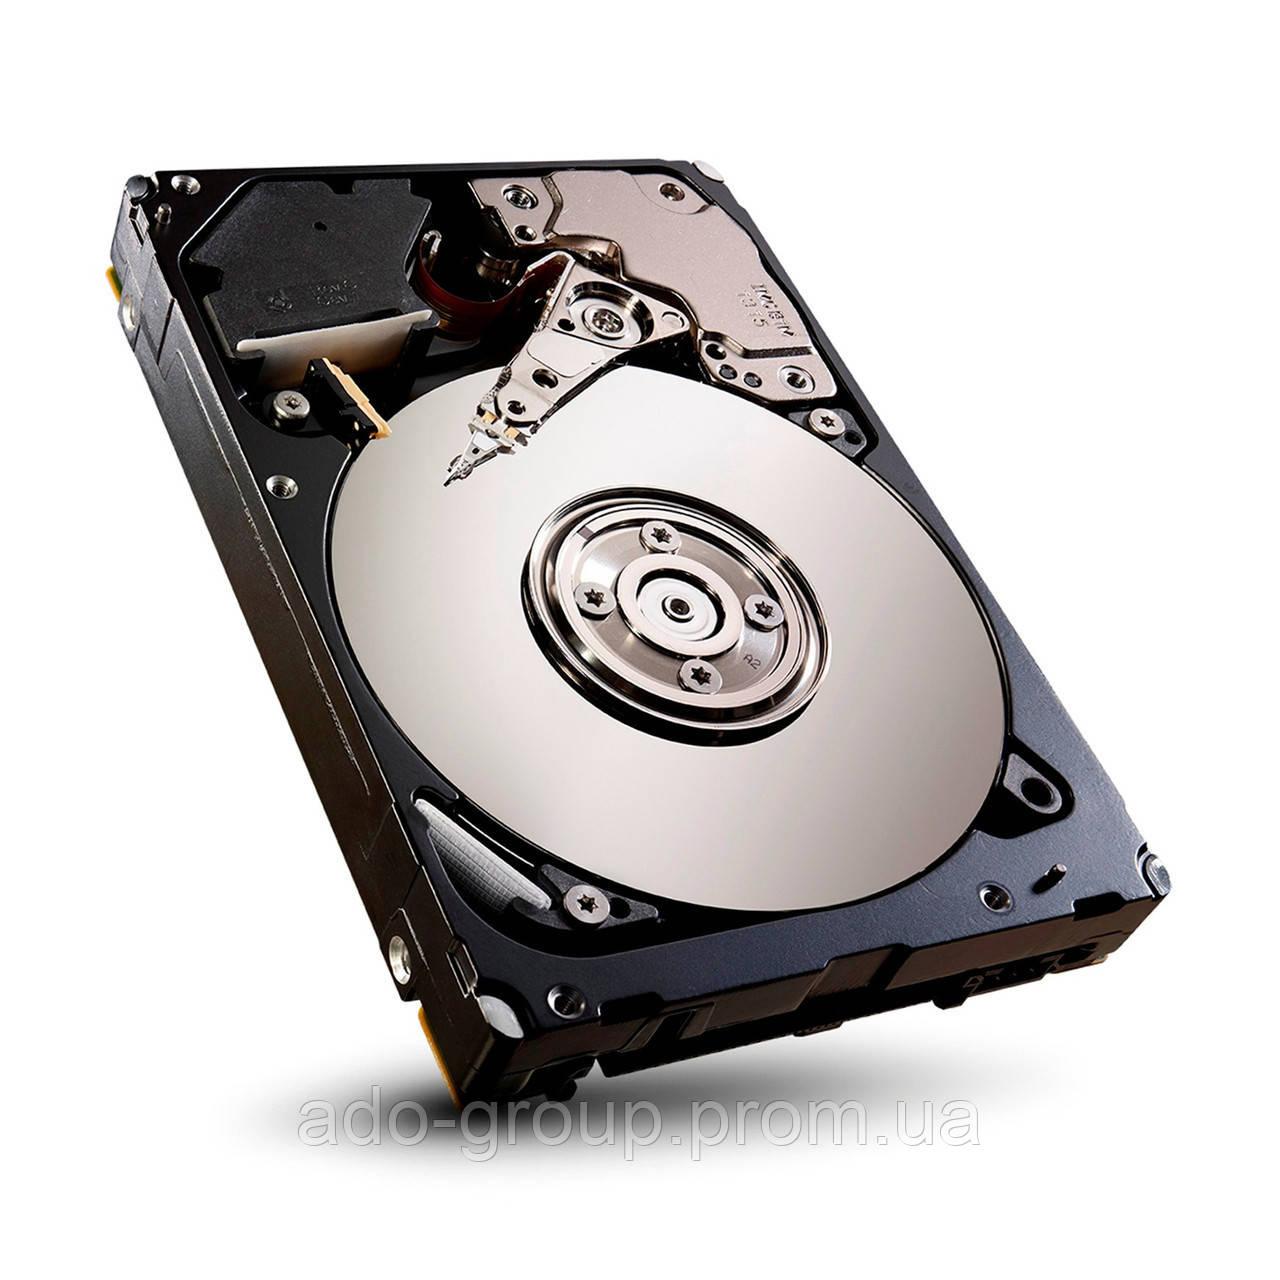 "G8762 Жесткий диск Dell 36GB SAS 10K  2.5"" +"